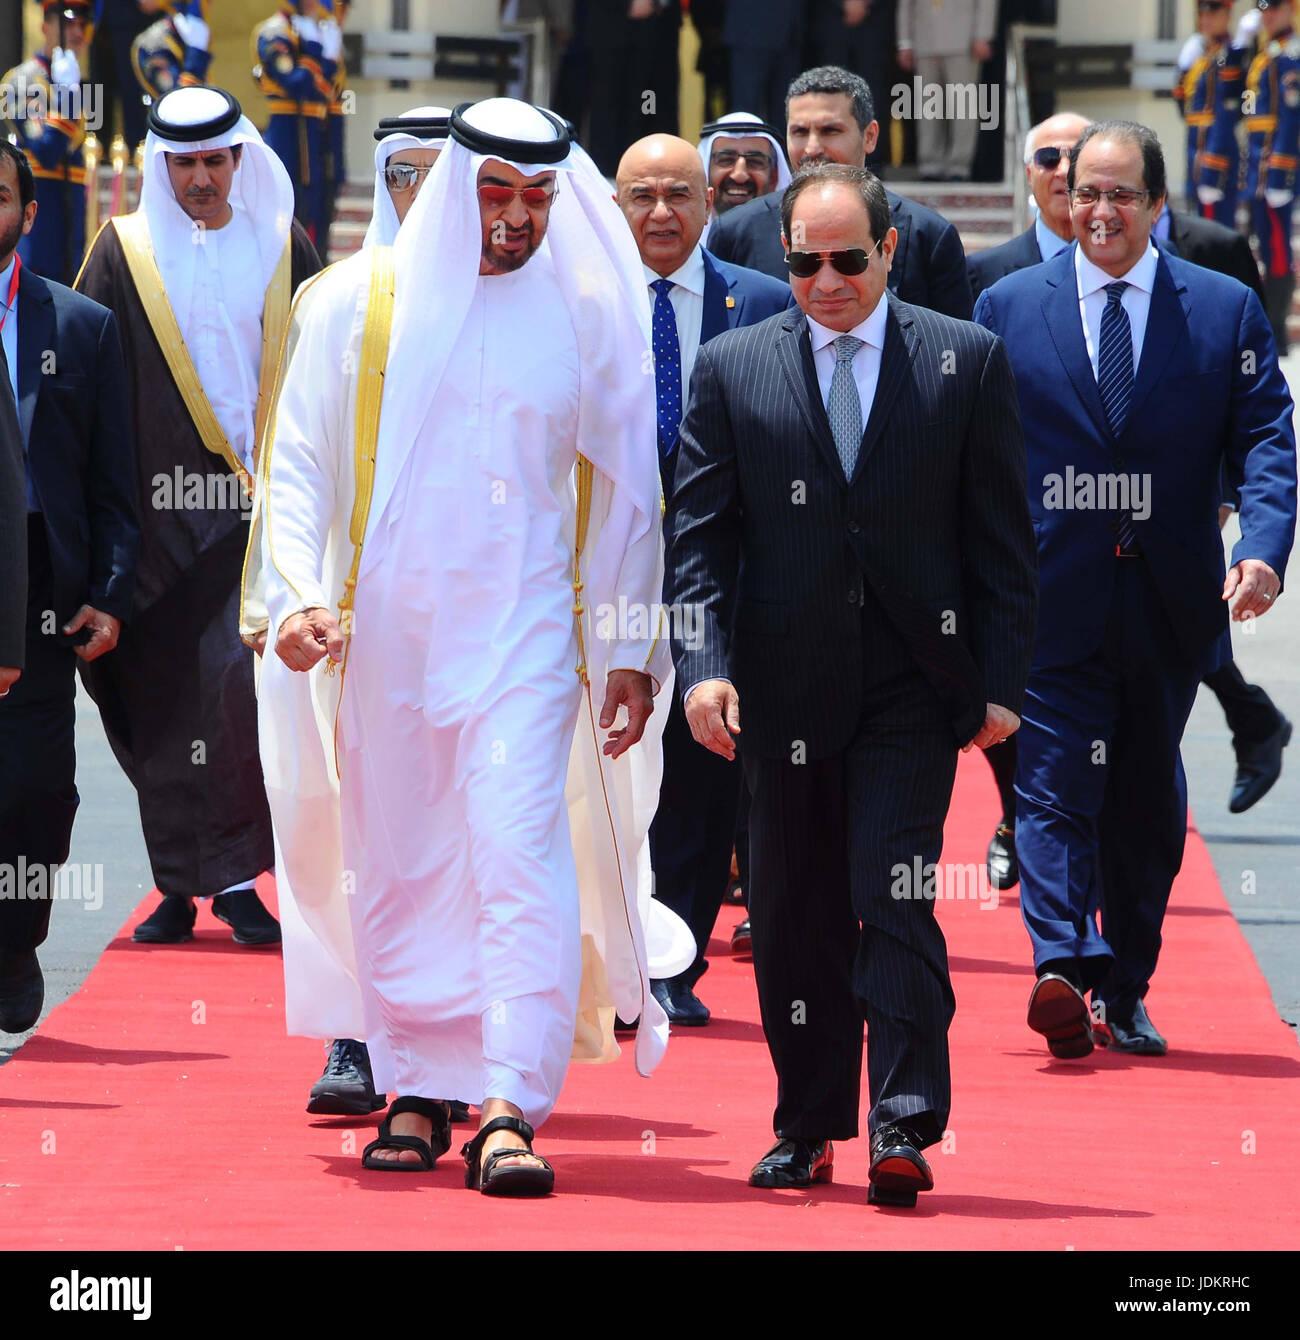 Egyptian President Abdel Fattah Sisi bids farewell